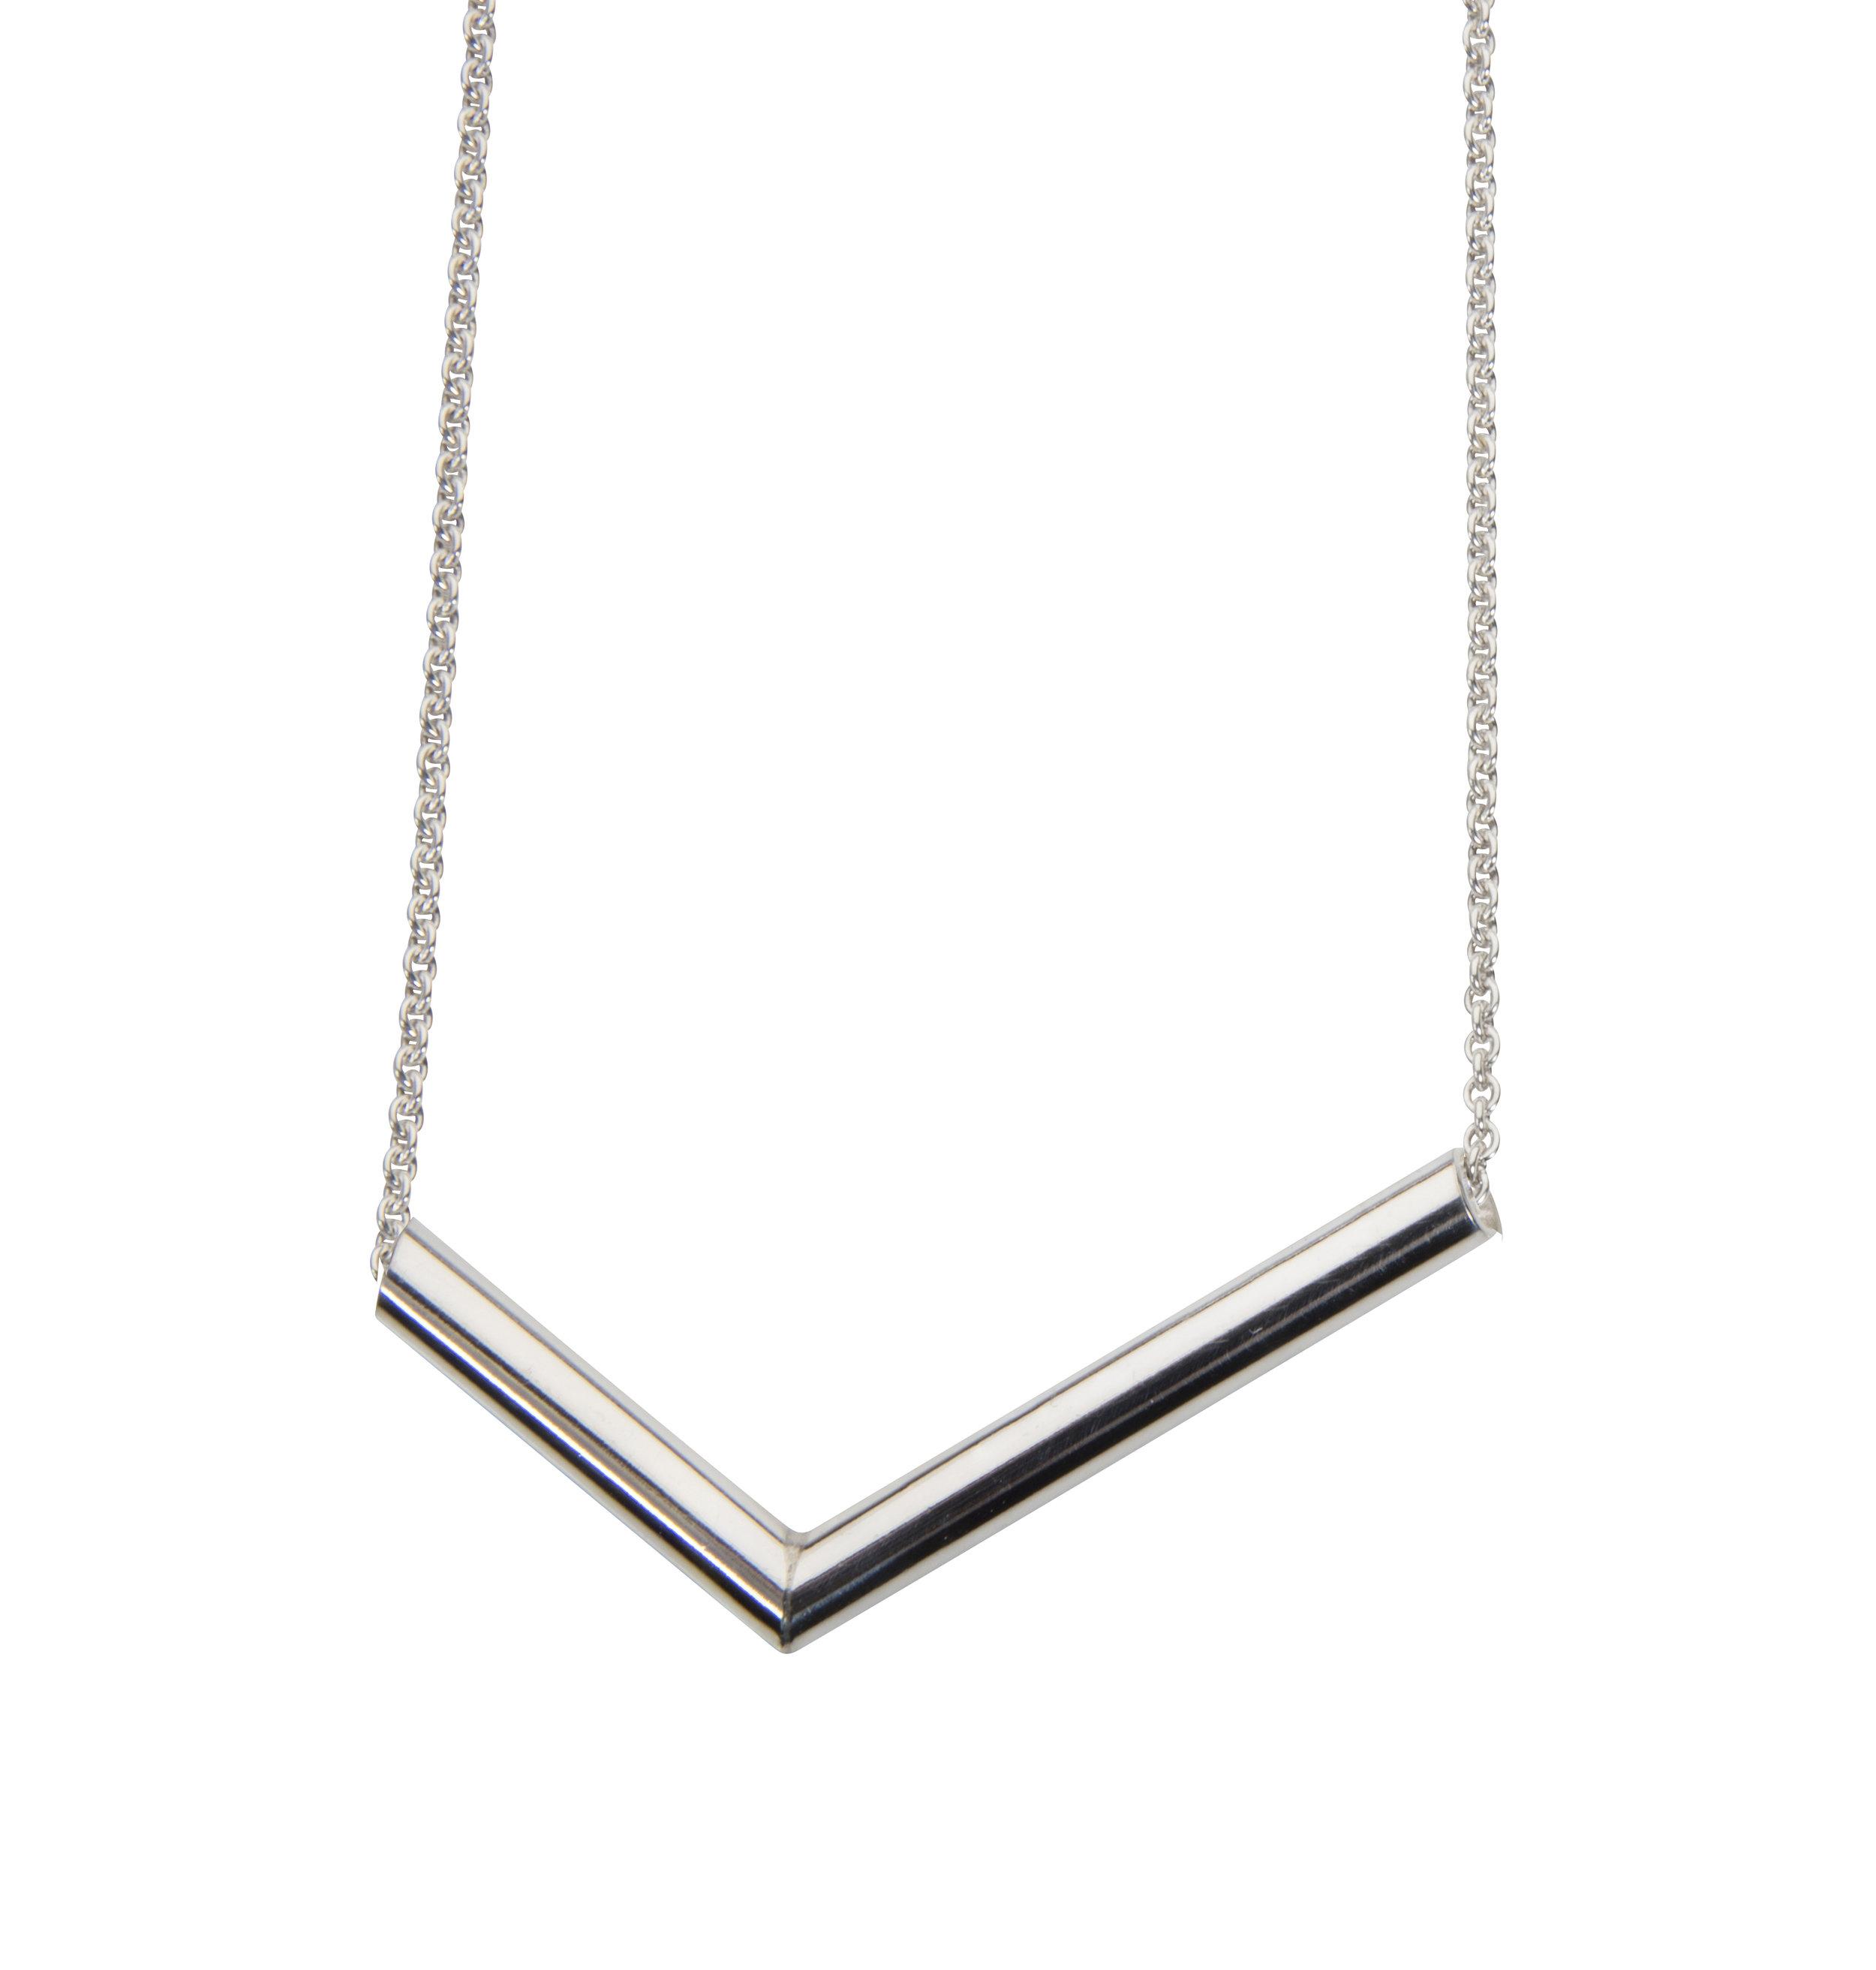 Emma Farquharson 108 degree angle pendant silver shiny.jpg